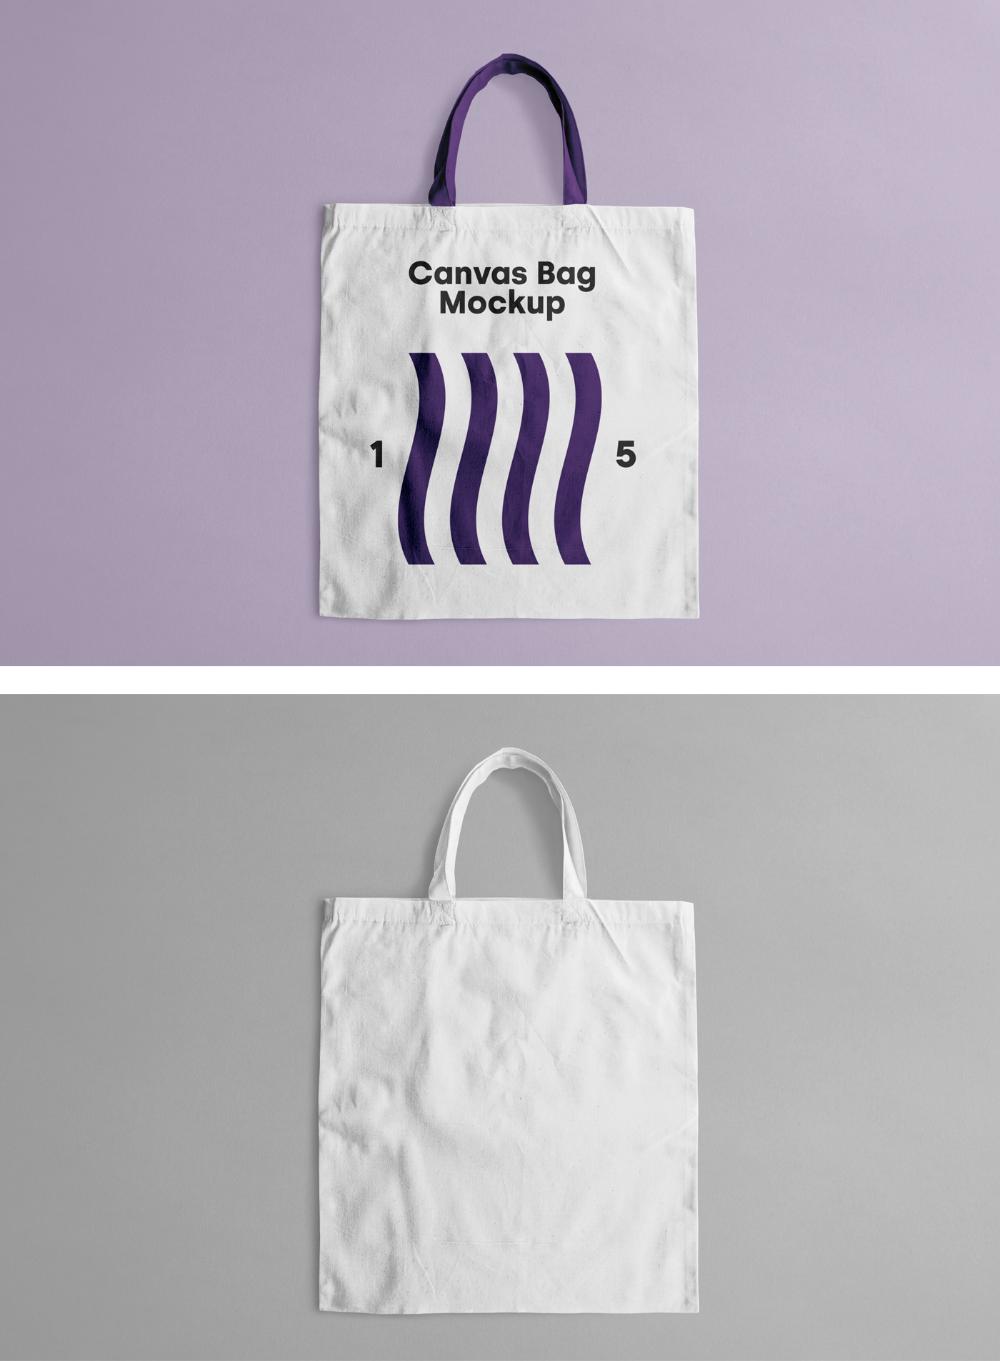 Download Canvas Tote Bag Mockup Mr Mockup Graphic Design Freebies Bag Mockup Canvas Tote Tote Bag